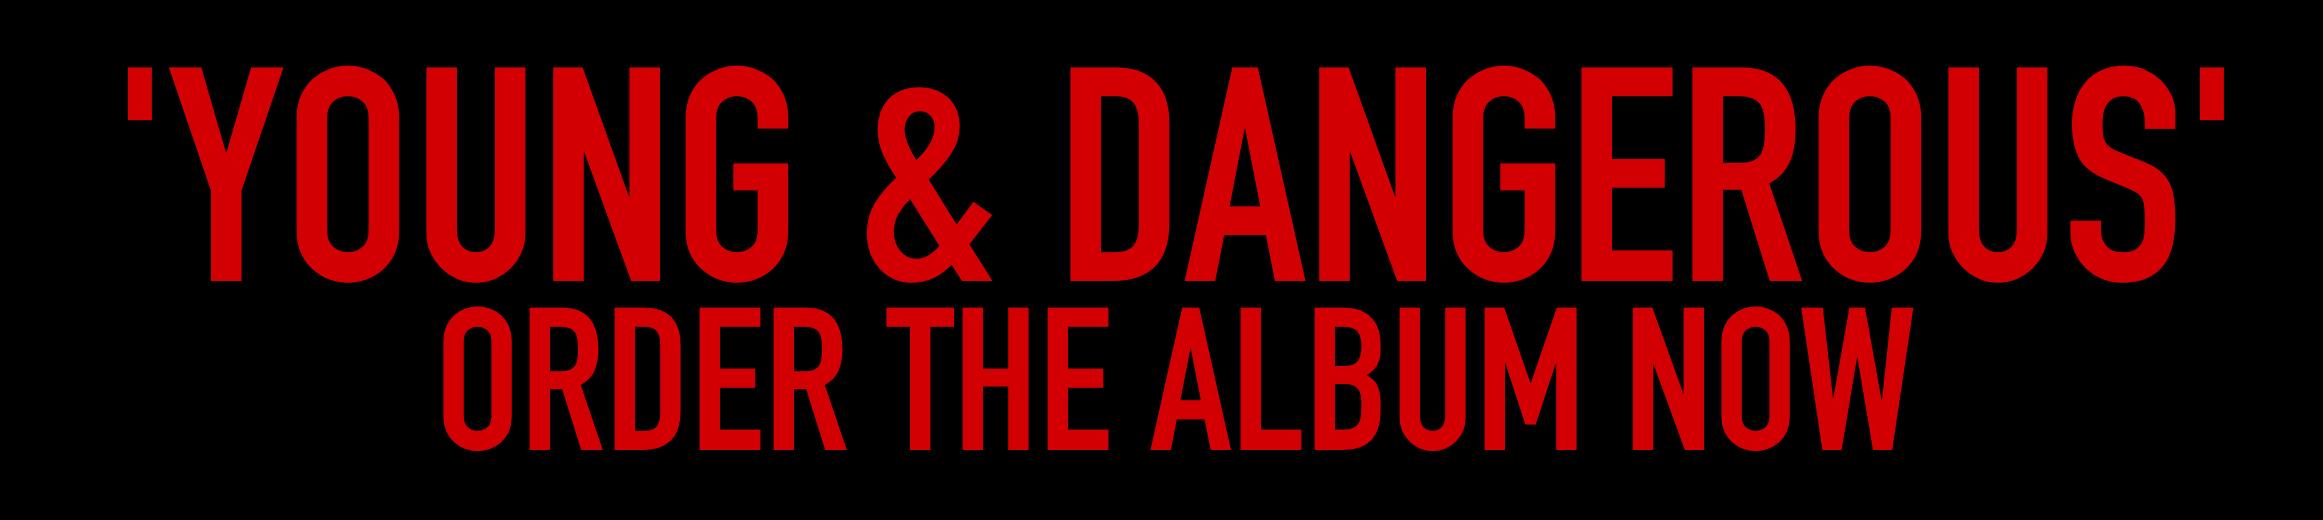 STRUTS ALBUM ORDER.jpg